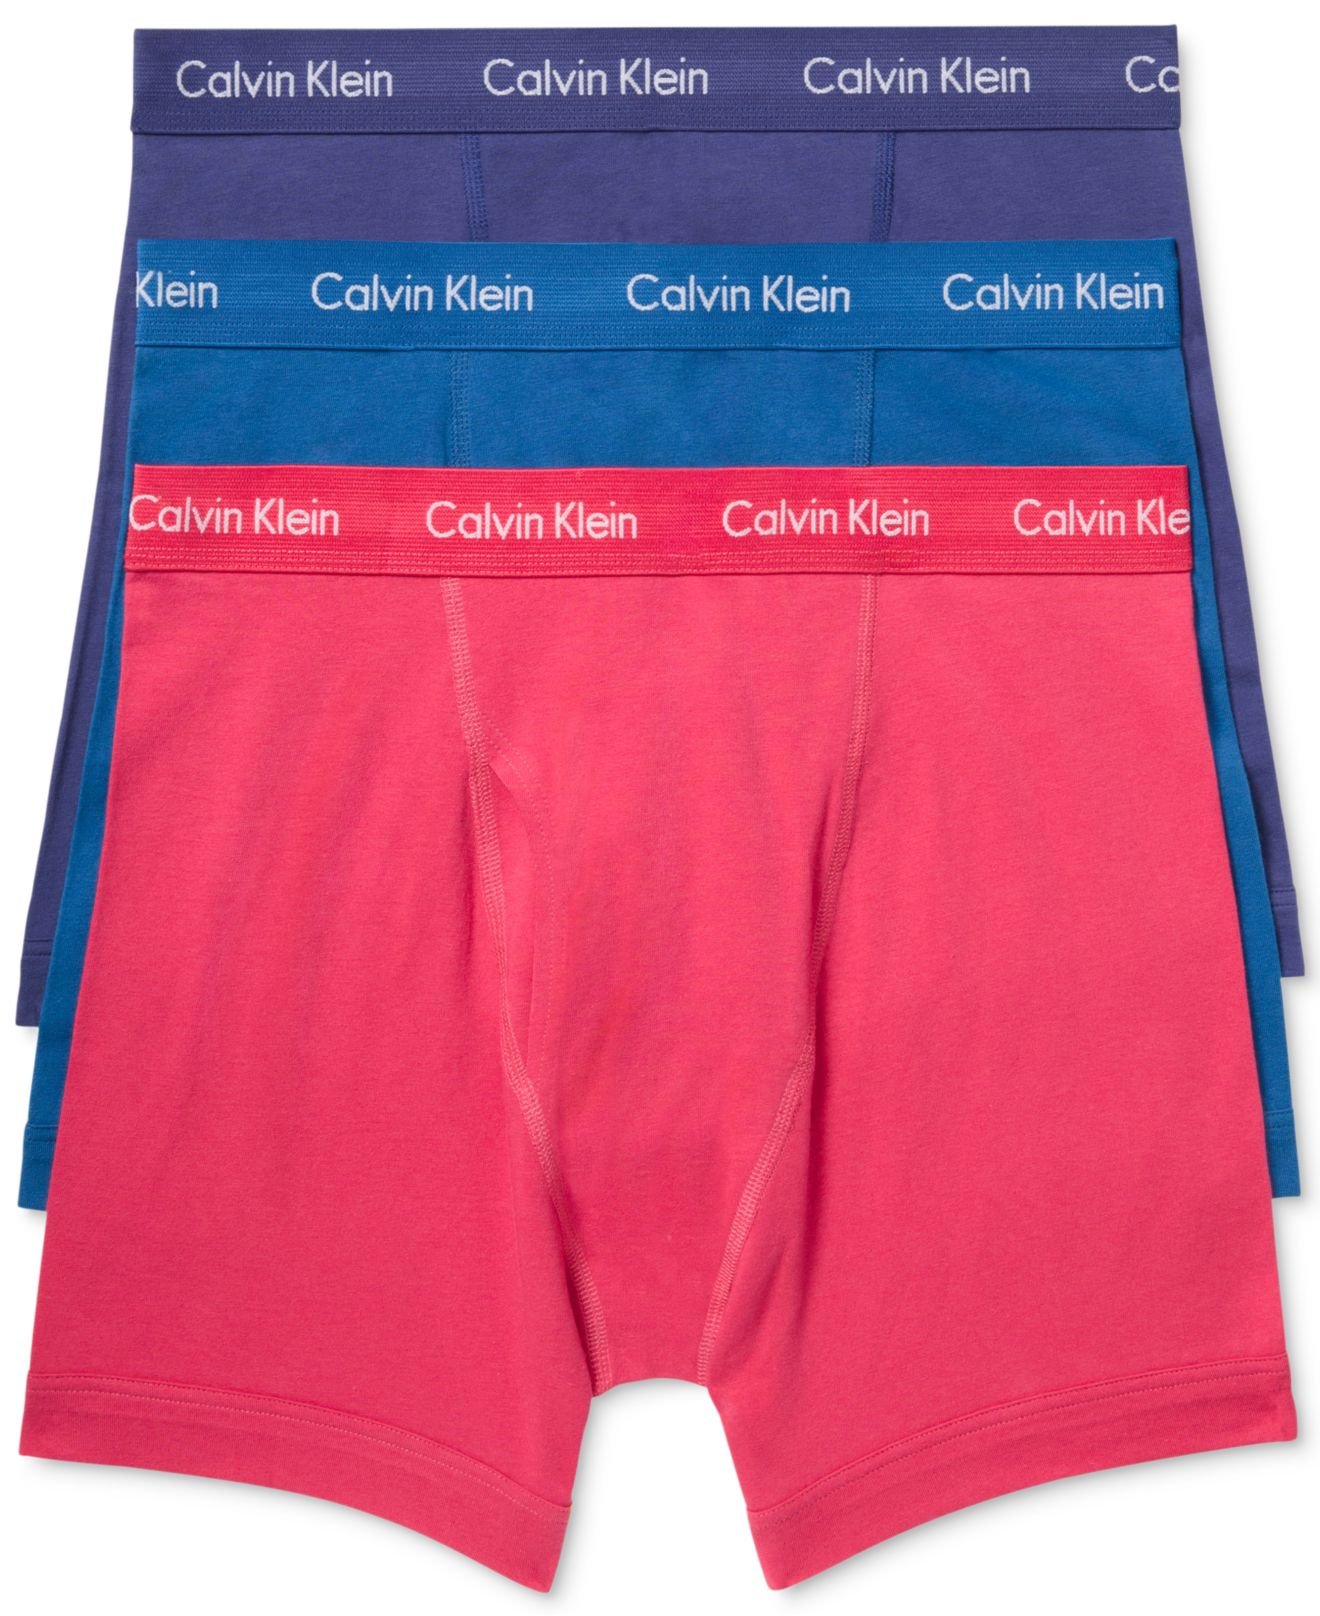 f60e62010f5 Lyst - Calvin Klein Men s Cotton Stretch Boxer Briefs 3-pack in Blue ...